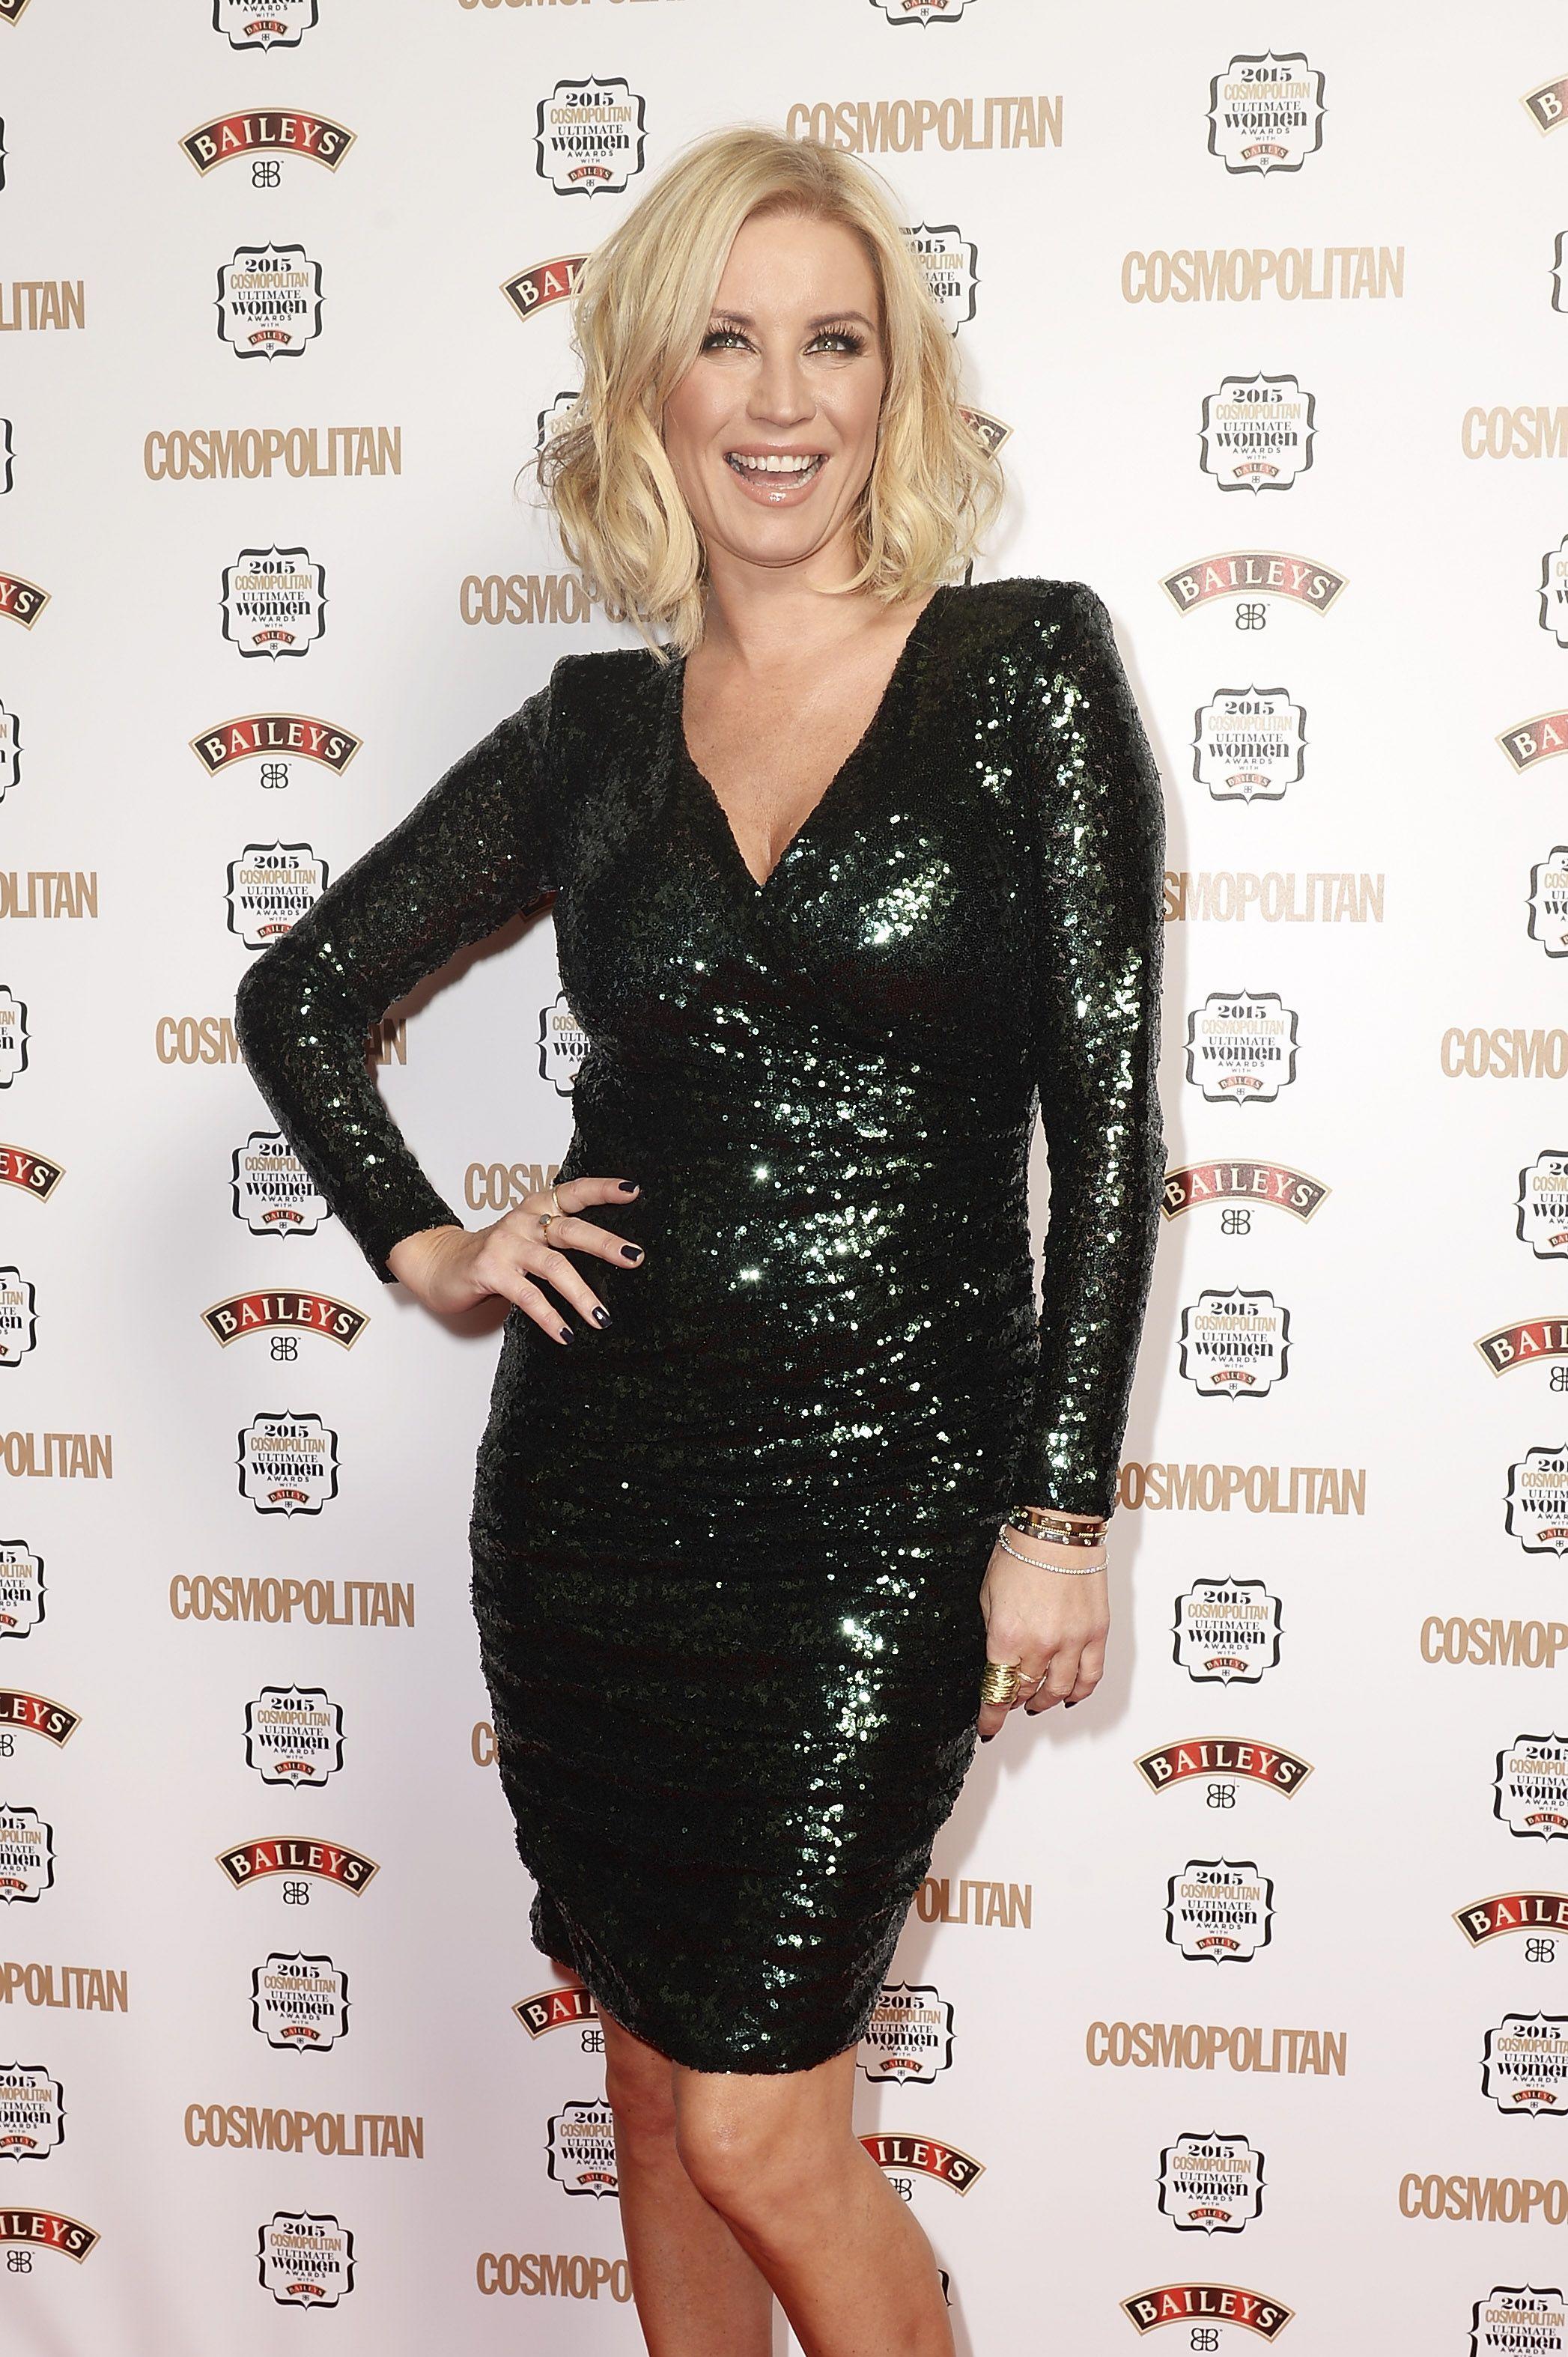 Alesha dixon pictures cosmopolitan ultimate women of the year awards - Cosmopolitan S Ultimate Women Of The Year Awards All The Red Carpet Photos